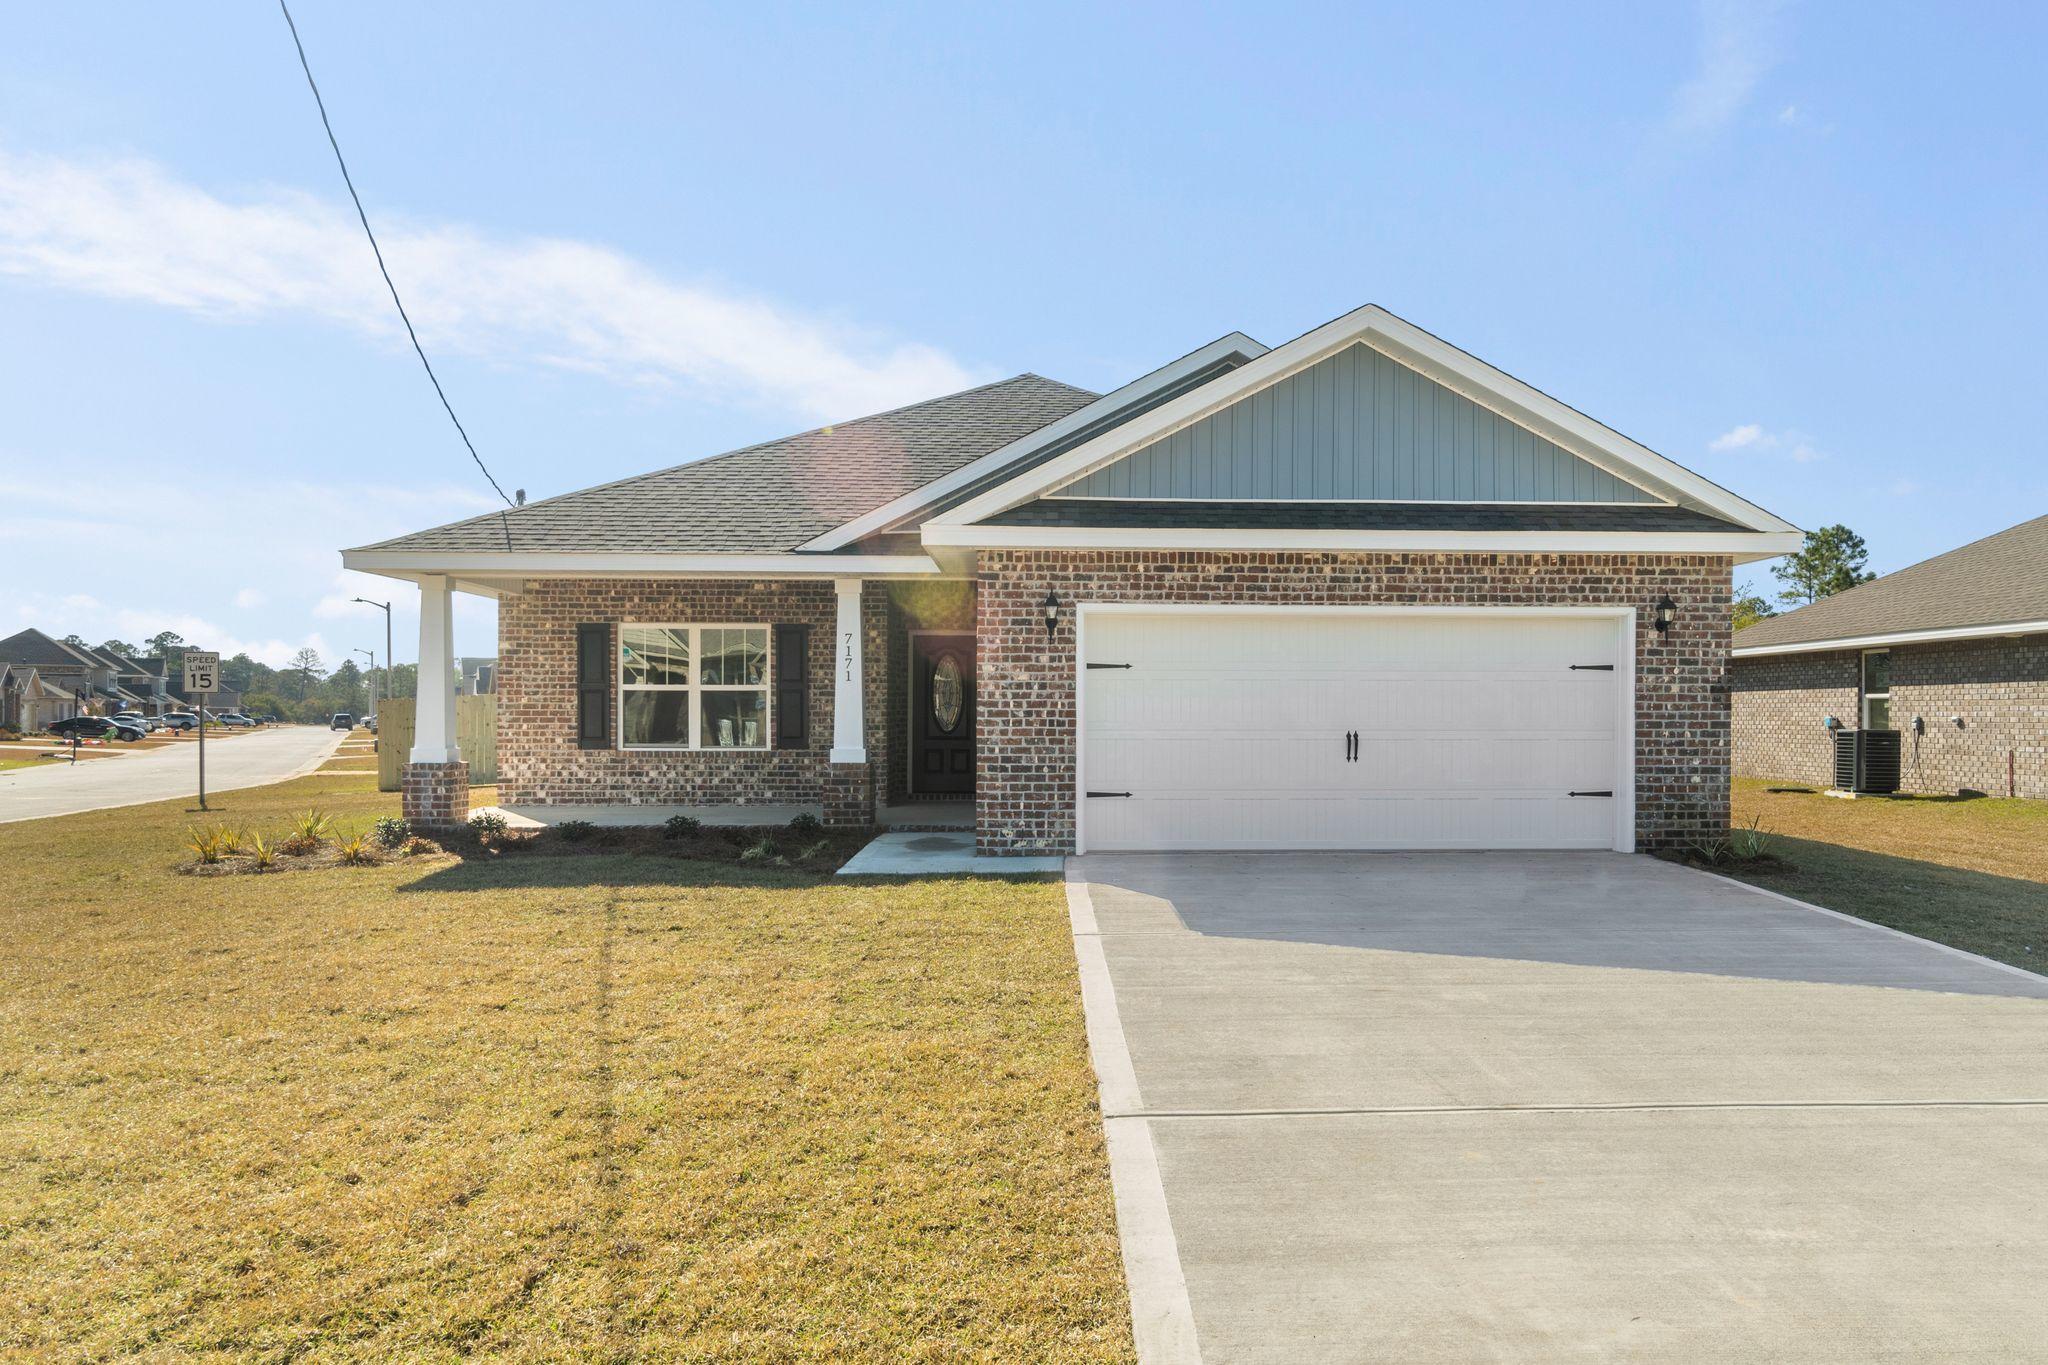 Photo of home for sale at 7139 Gordon Evans, Navarre FL